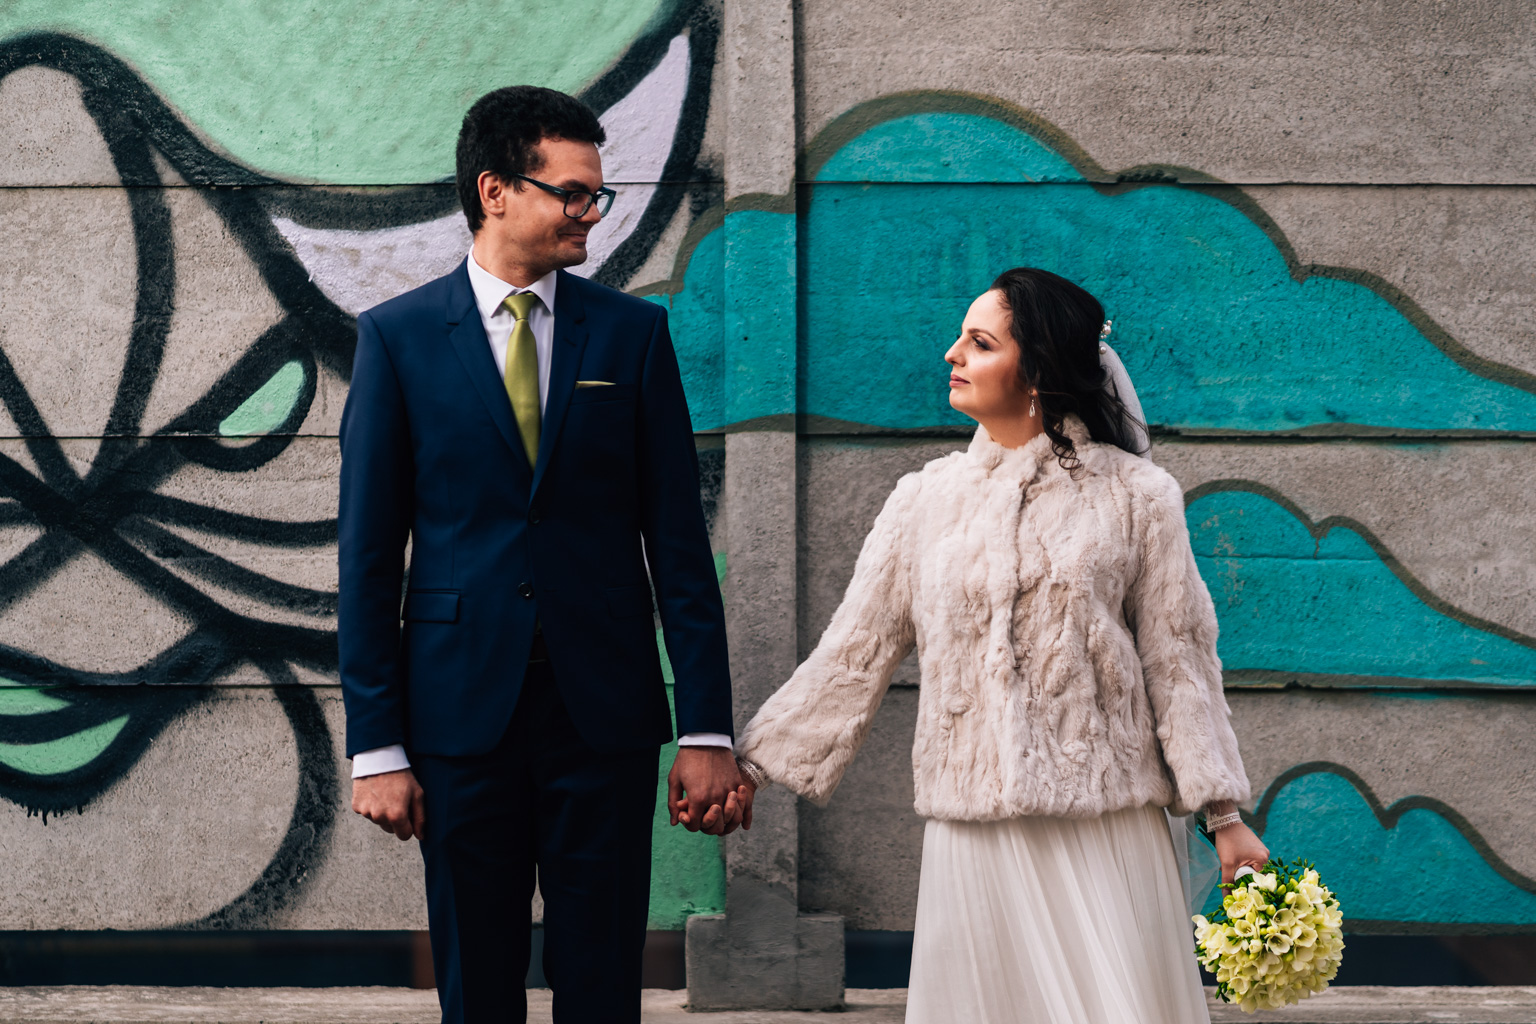 "<span class=""hidepagetitles_toggle_title"">Sedinta foto de nunta iarna: ce elemente trebuie sa iei in considerare?</span>"